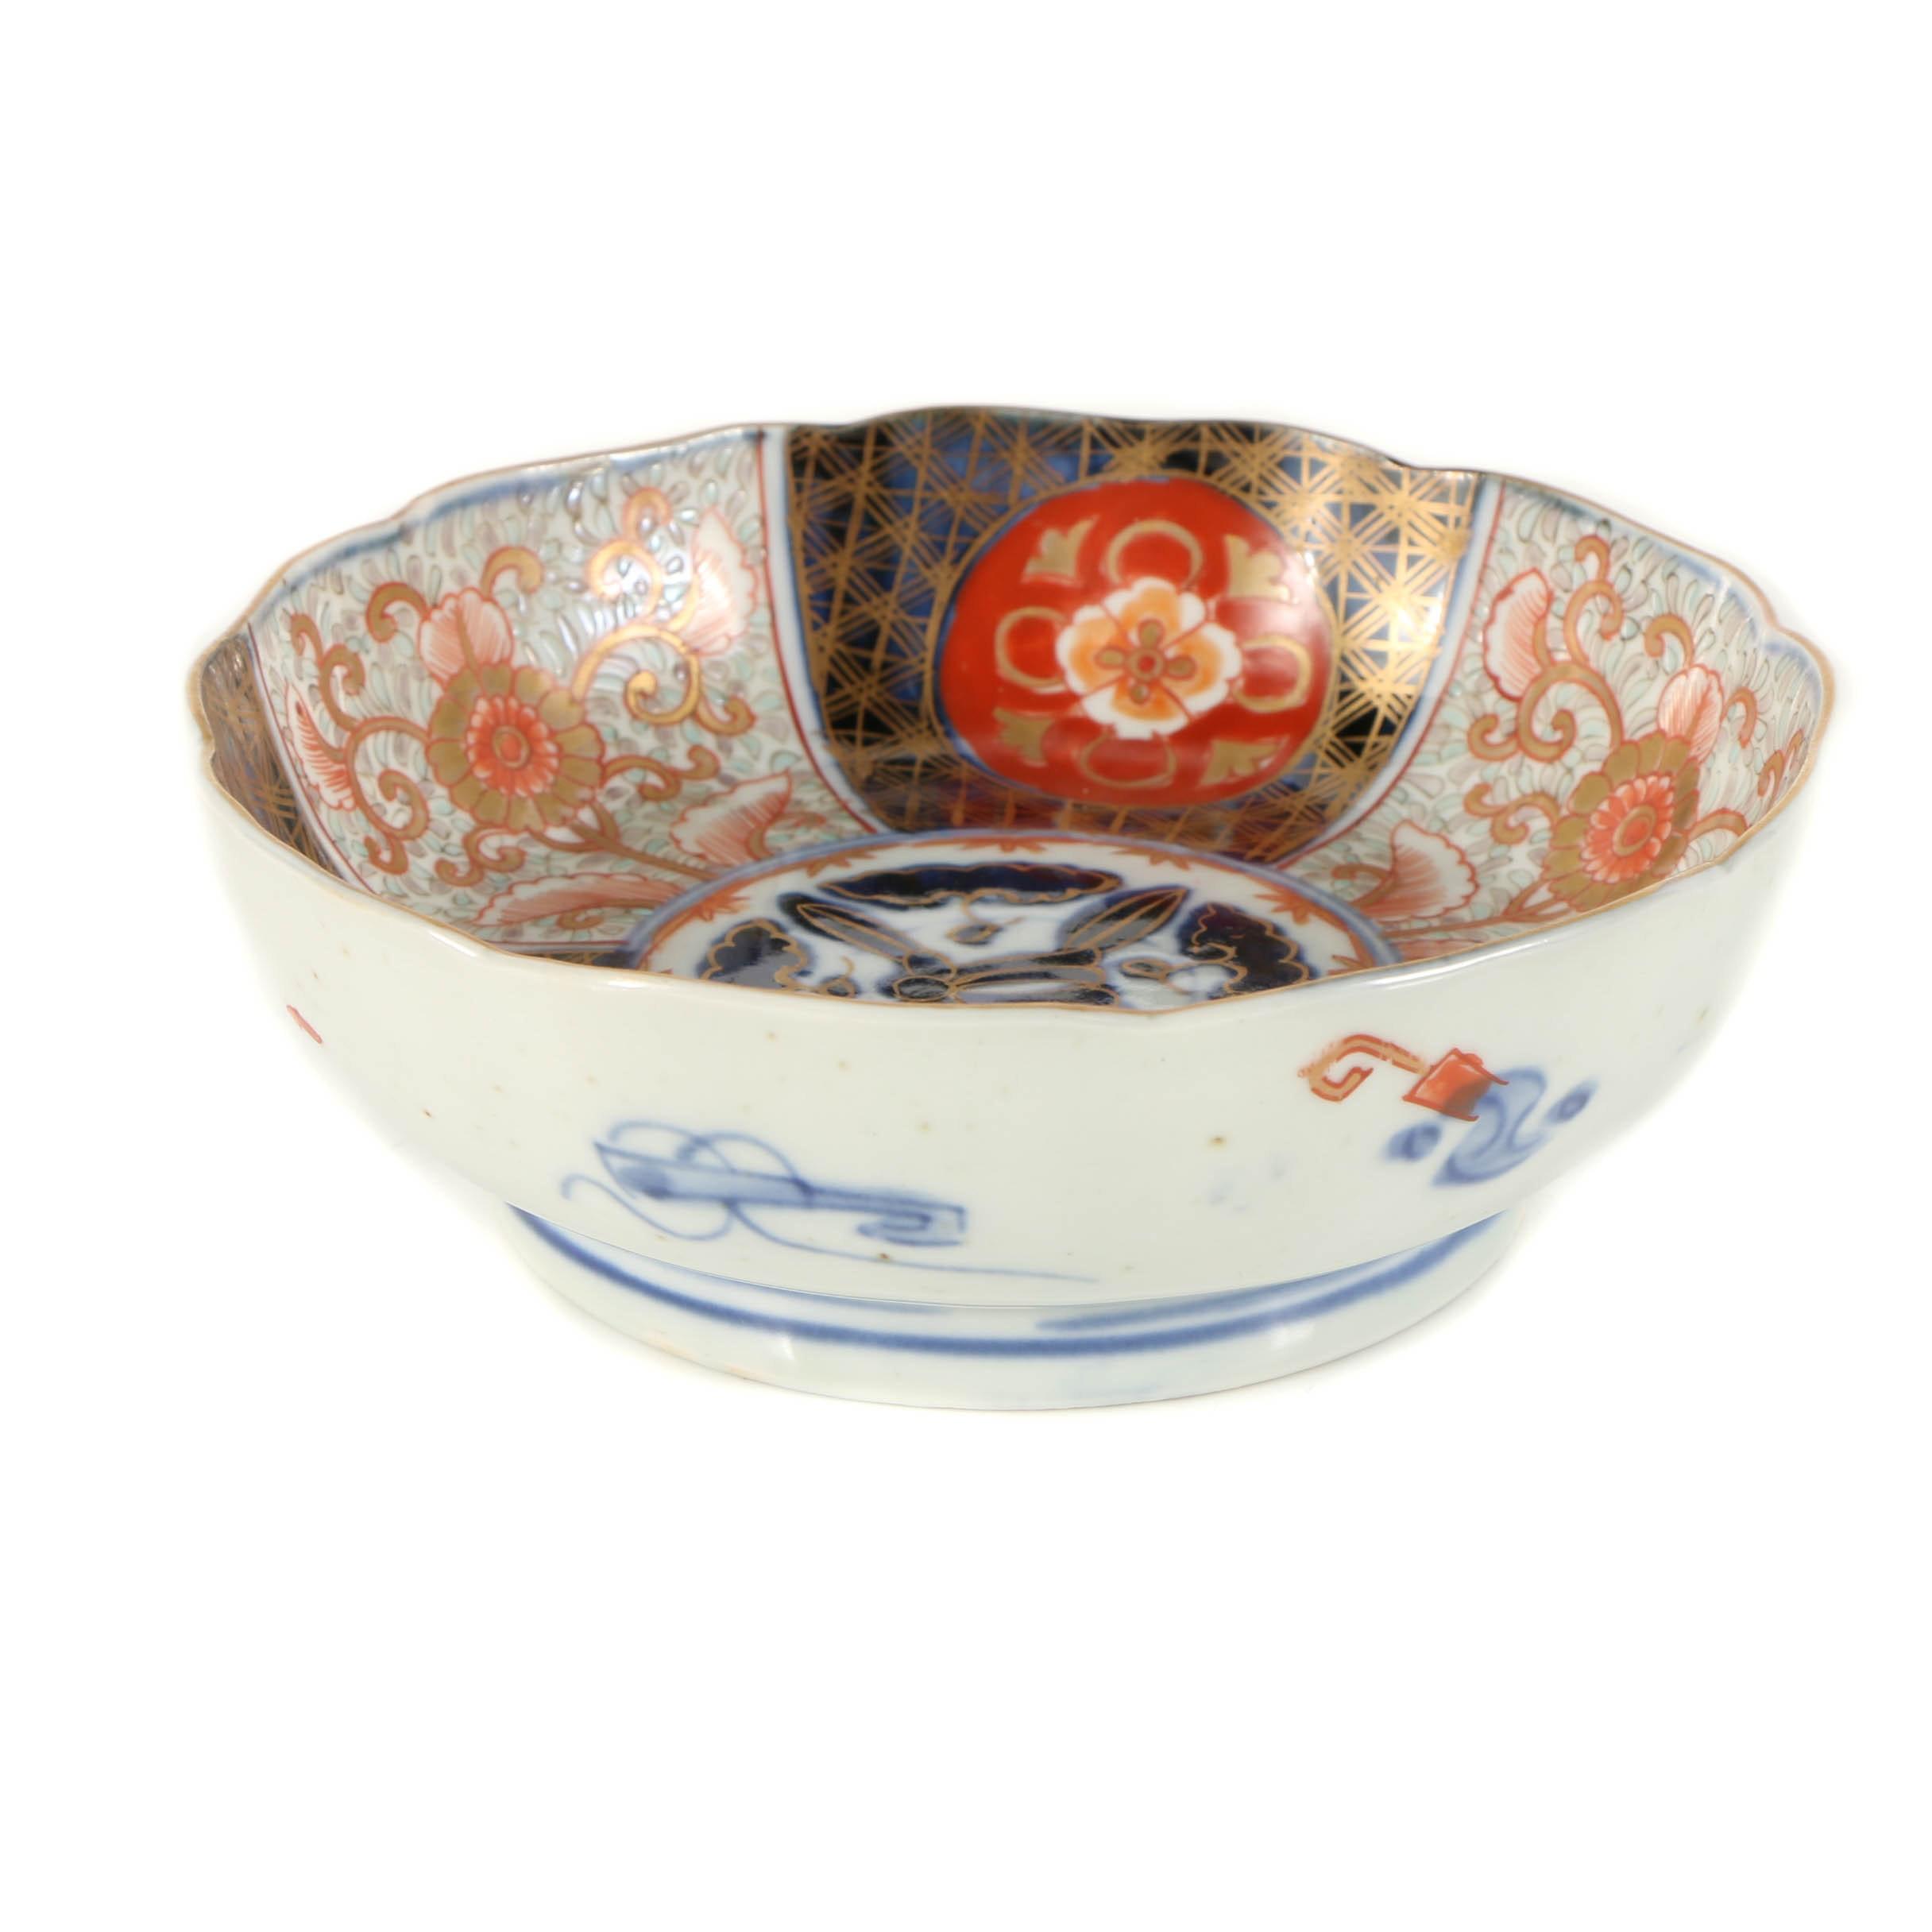 Japanese Imari Decorative Porcelain Dish